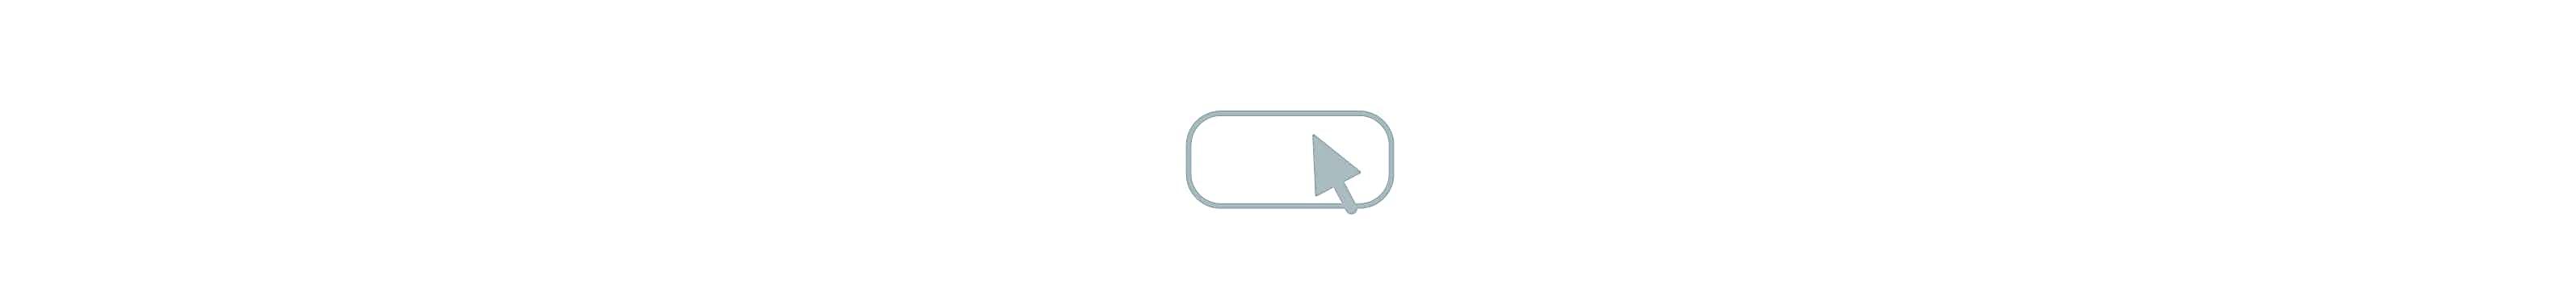 klick-symbol